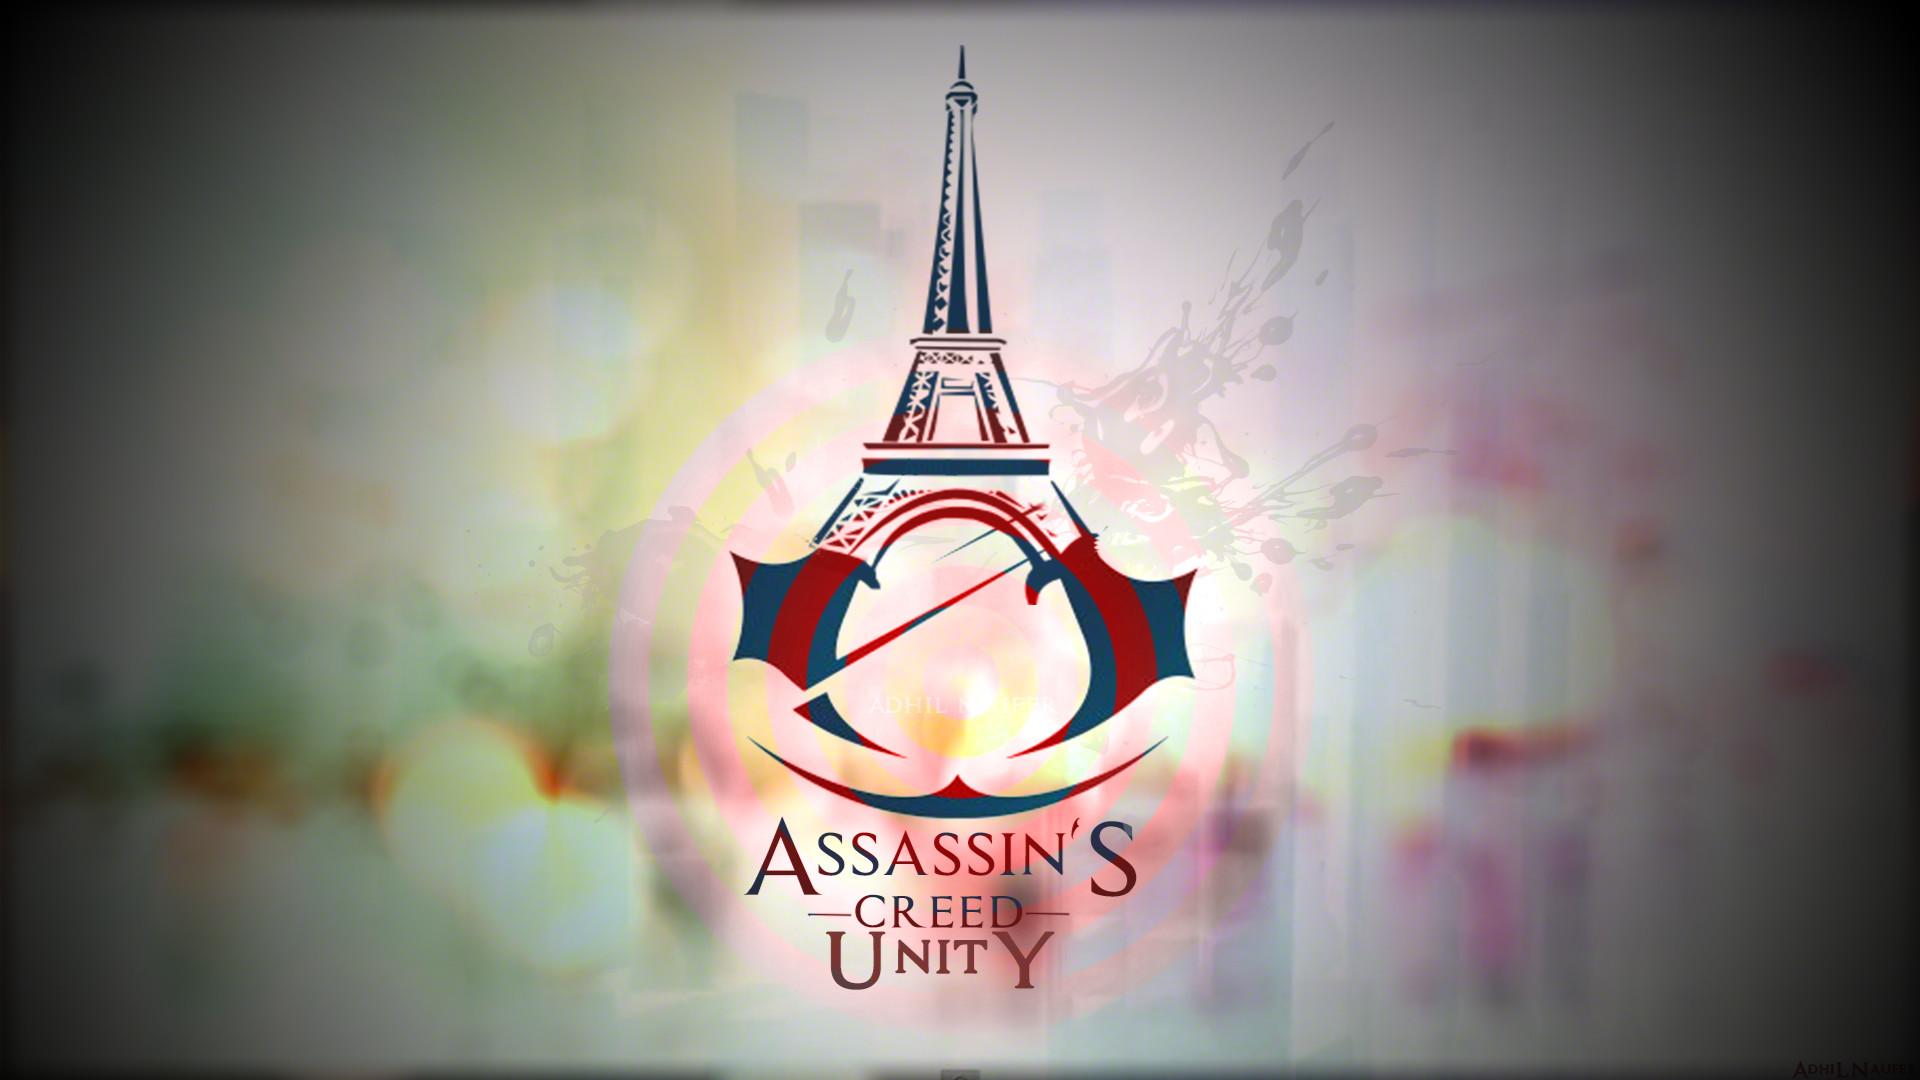 Assassins Creed Symbol Wallpapers Wallpaper | HD Wallpapers | Pinterest | Assassins  creed, Wallpaper and Wallpaper art